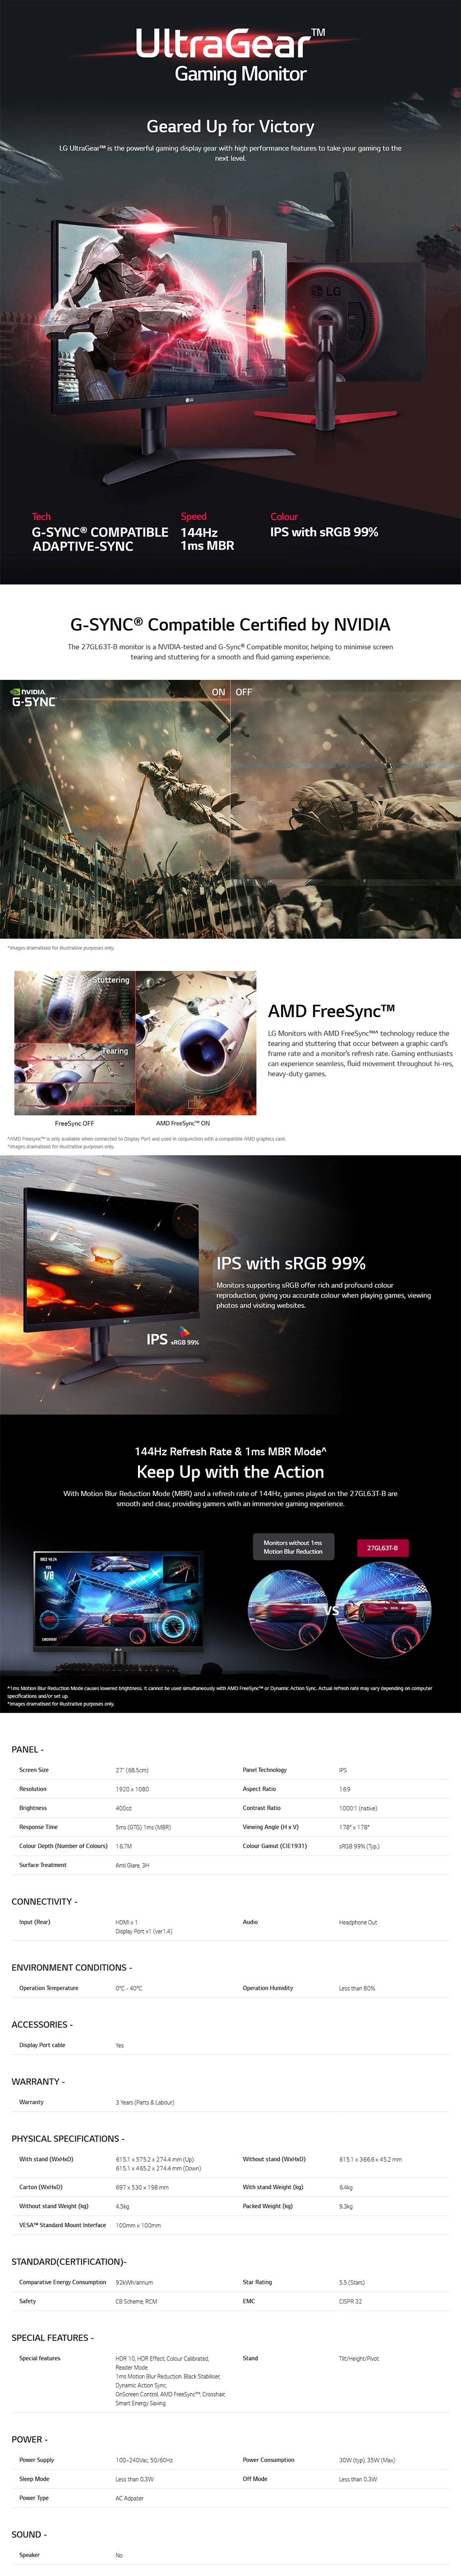 lg-27gl63tb-27-144hz-1ms-full-hd-hdr-gsync-compatible-ips-gaming-monitor-ac46076-8.jpg